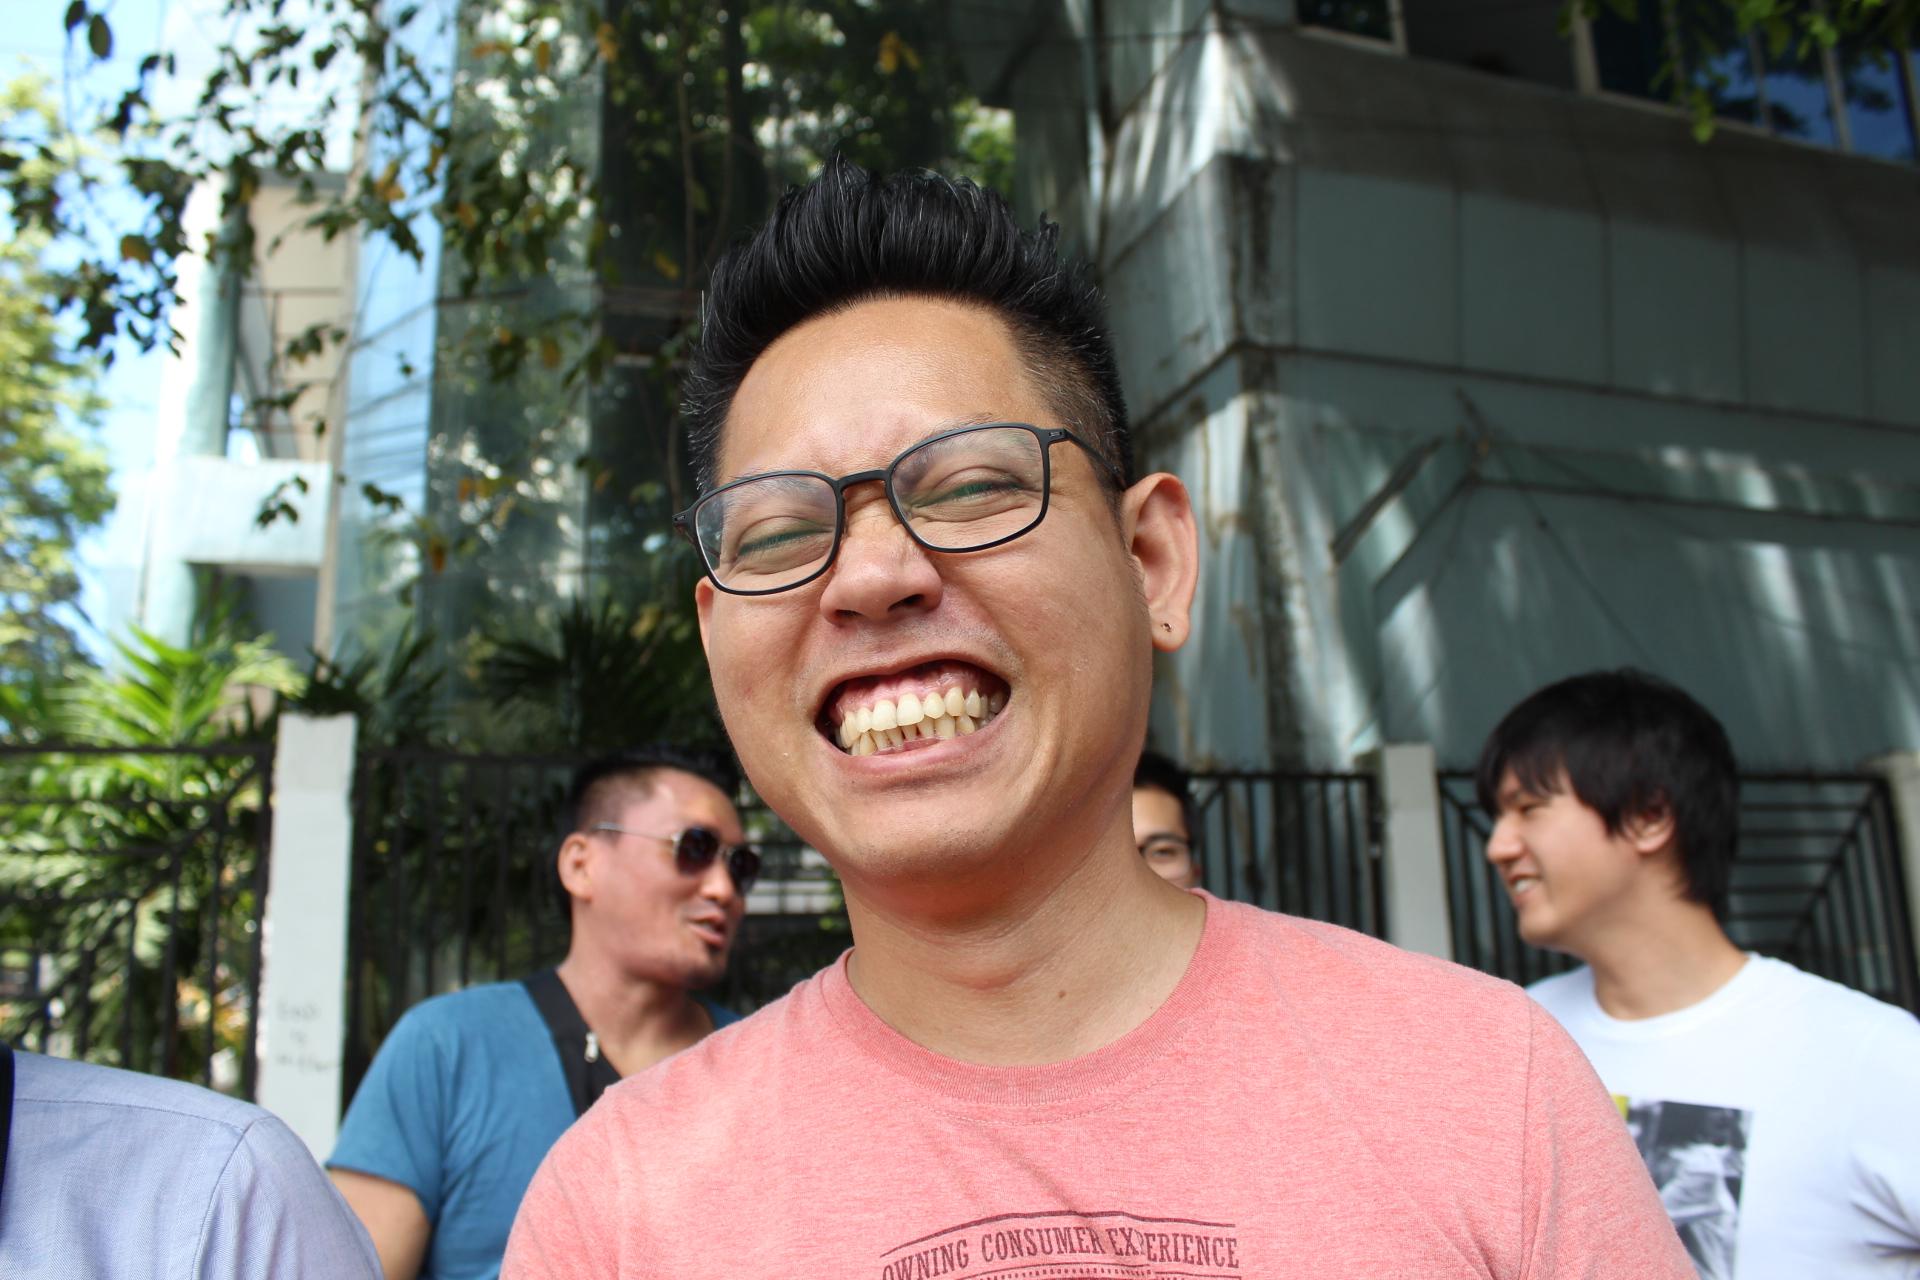 LIGフィリピンのエンジニア、パトリック